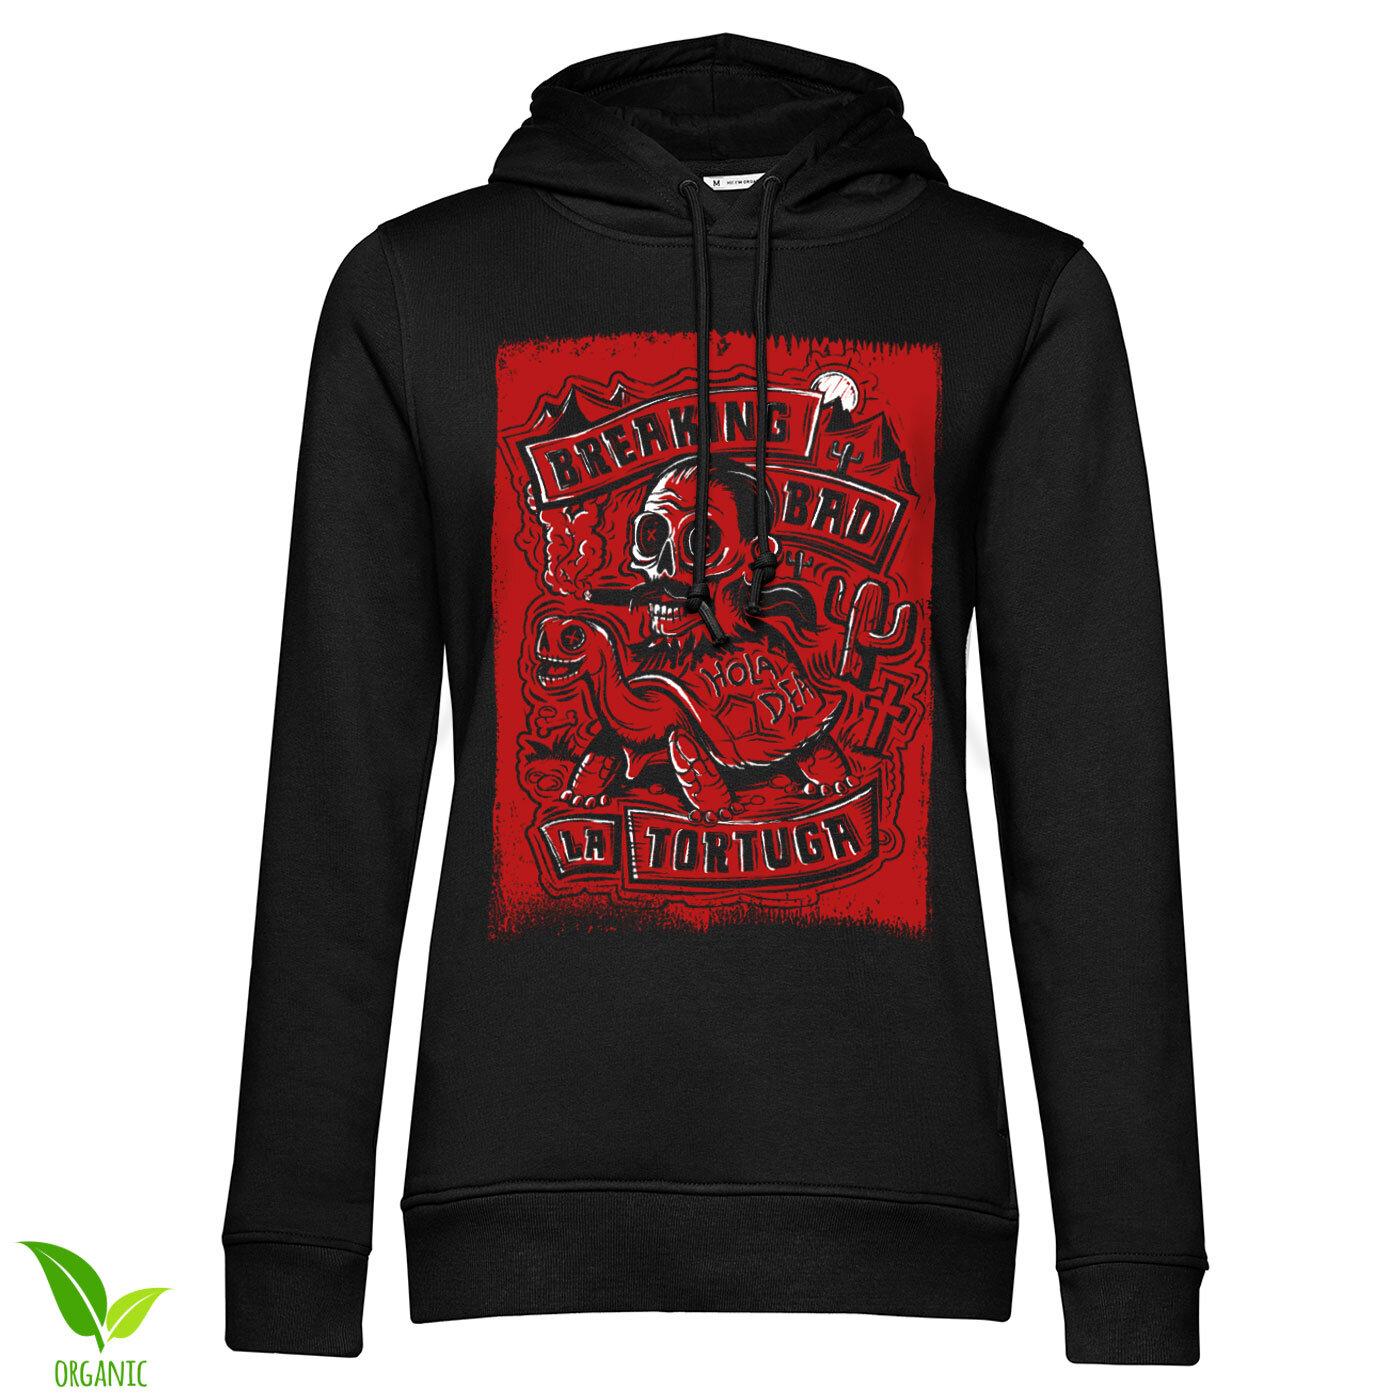 La Tortuga - Hola Death Epic Girls Hoodie